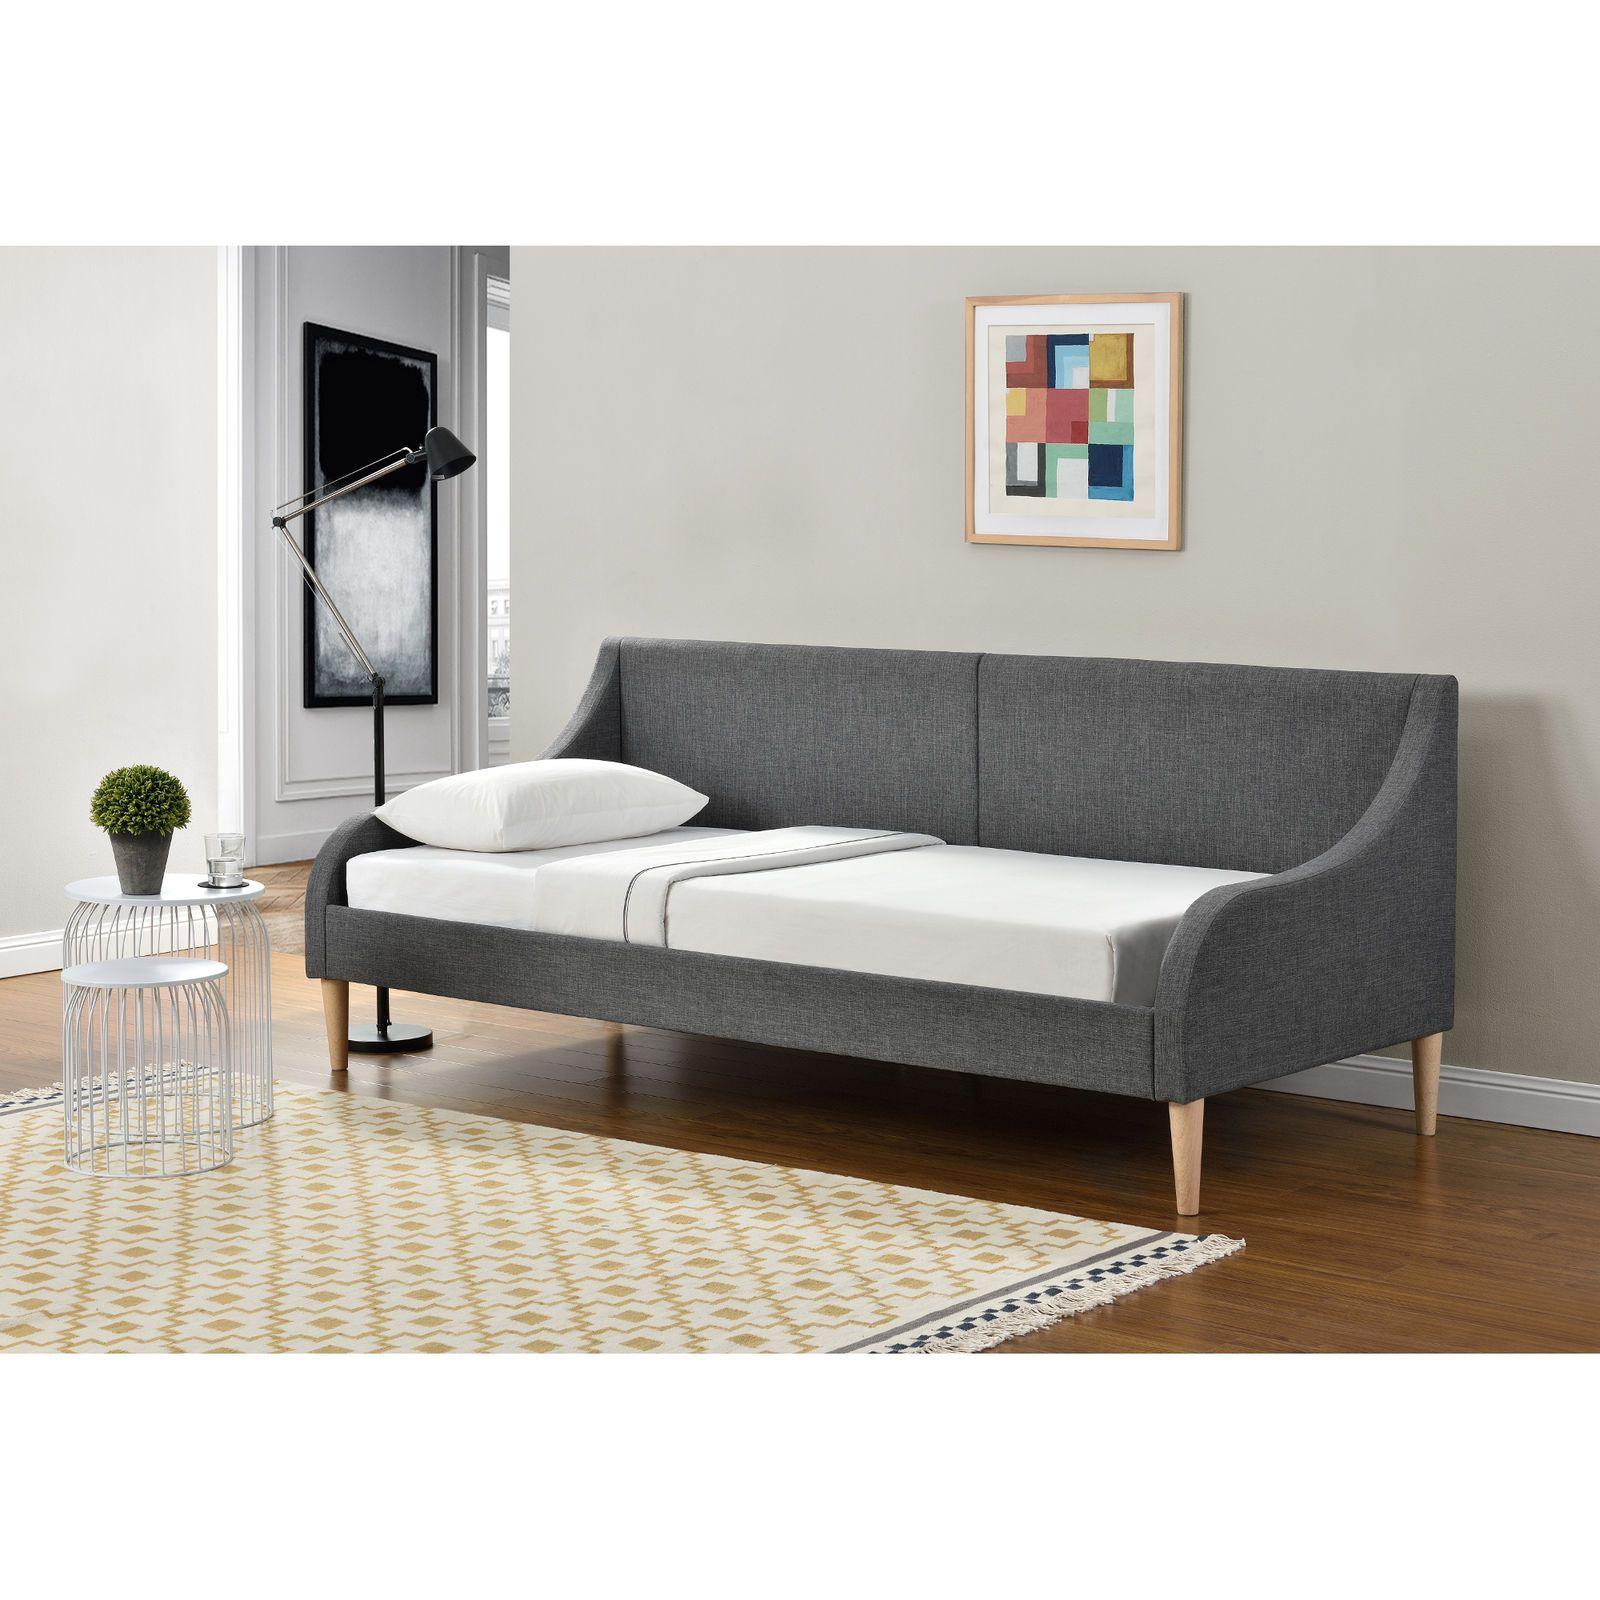 En Casa Tagesbett 90 X 200 Cm Schlafsofa Bett Textil Bettgestell Schlafzimmer Ebay Mit Bildern Bettgestell Tagesbett Bett 180x200